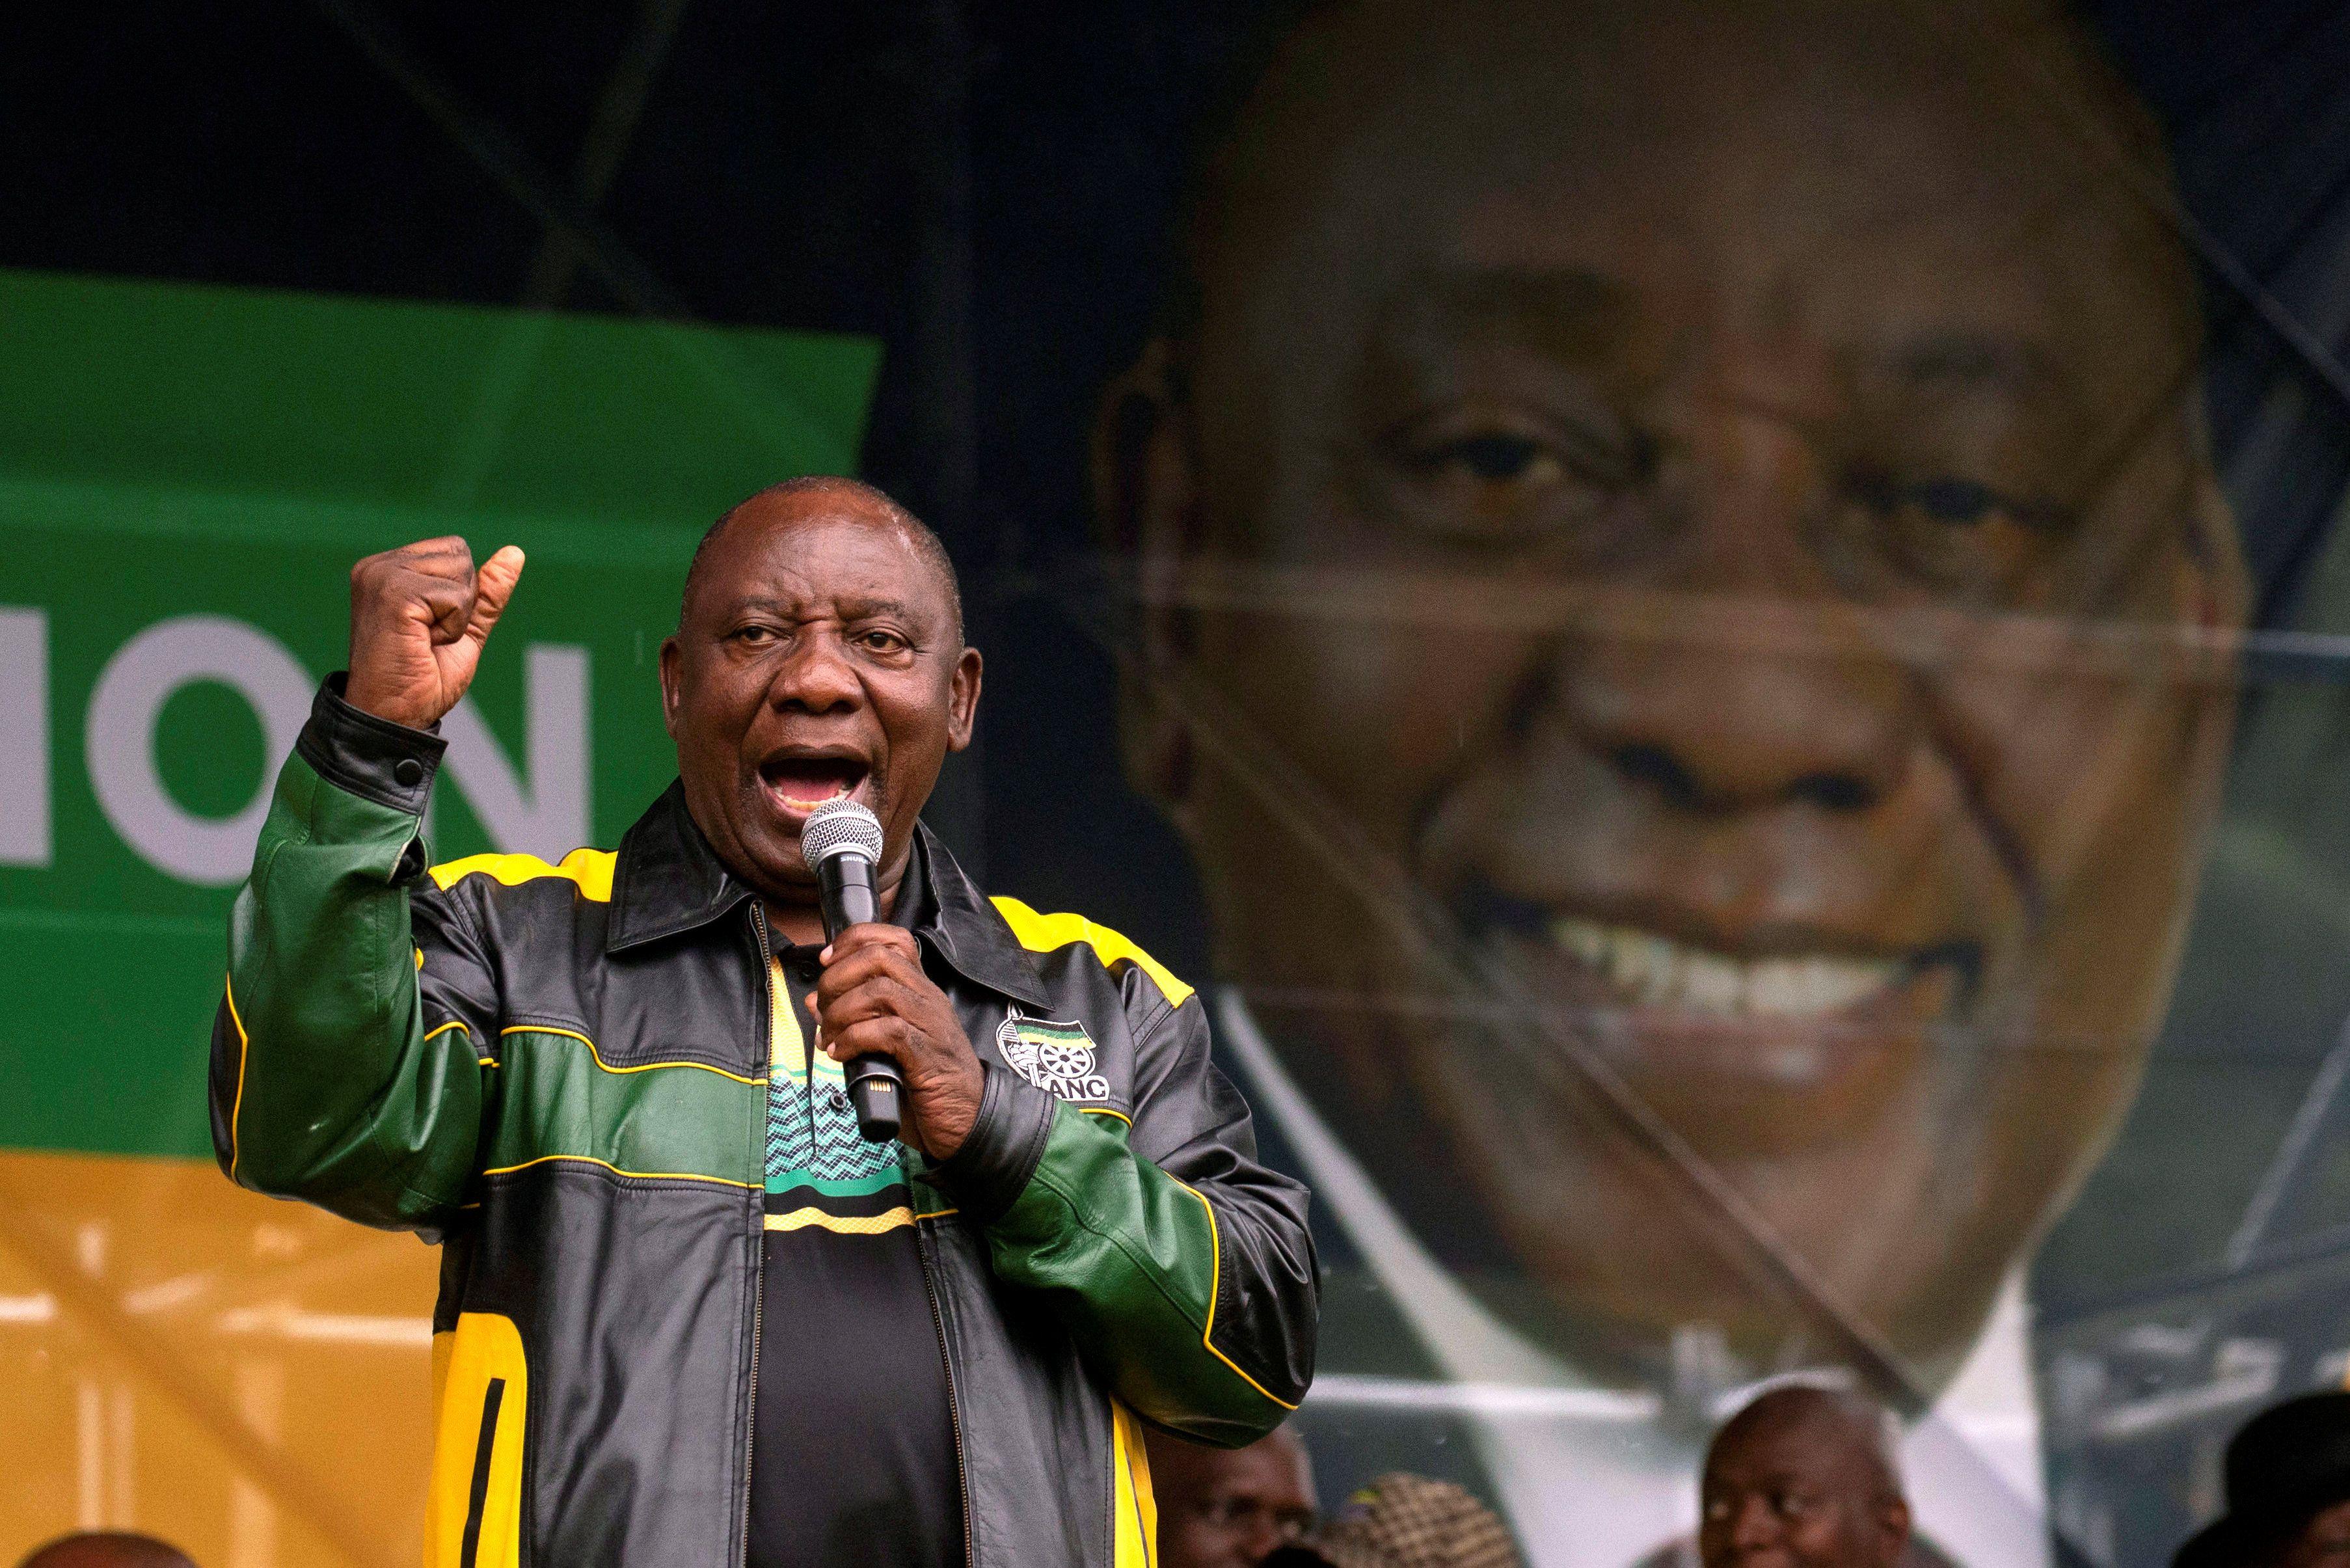 South Africa: Ramaphosa's Moment